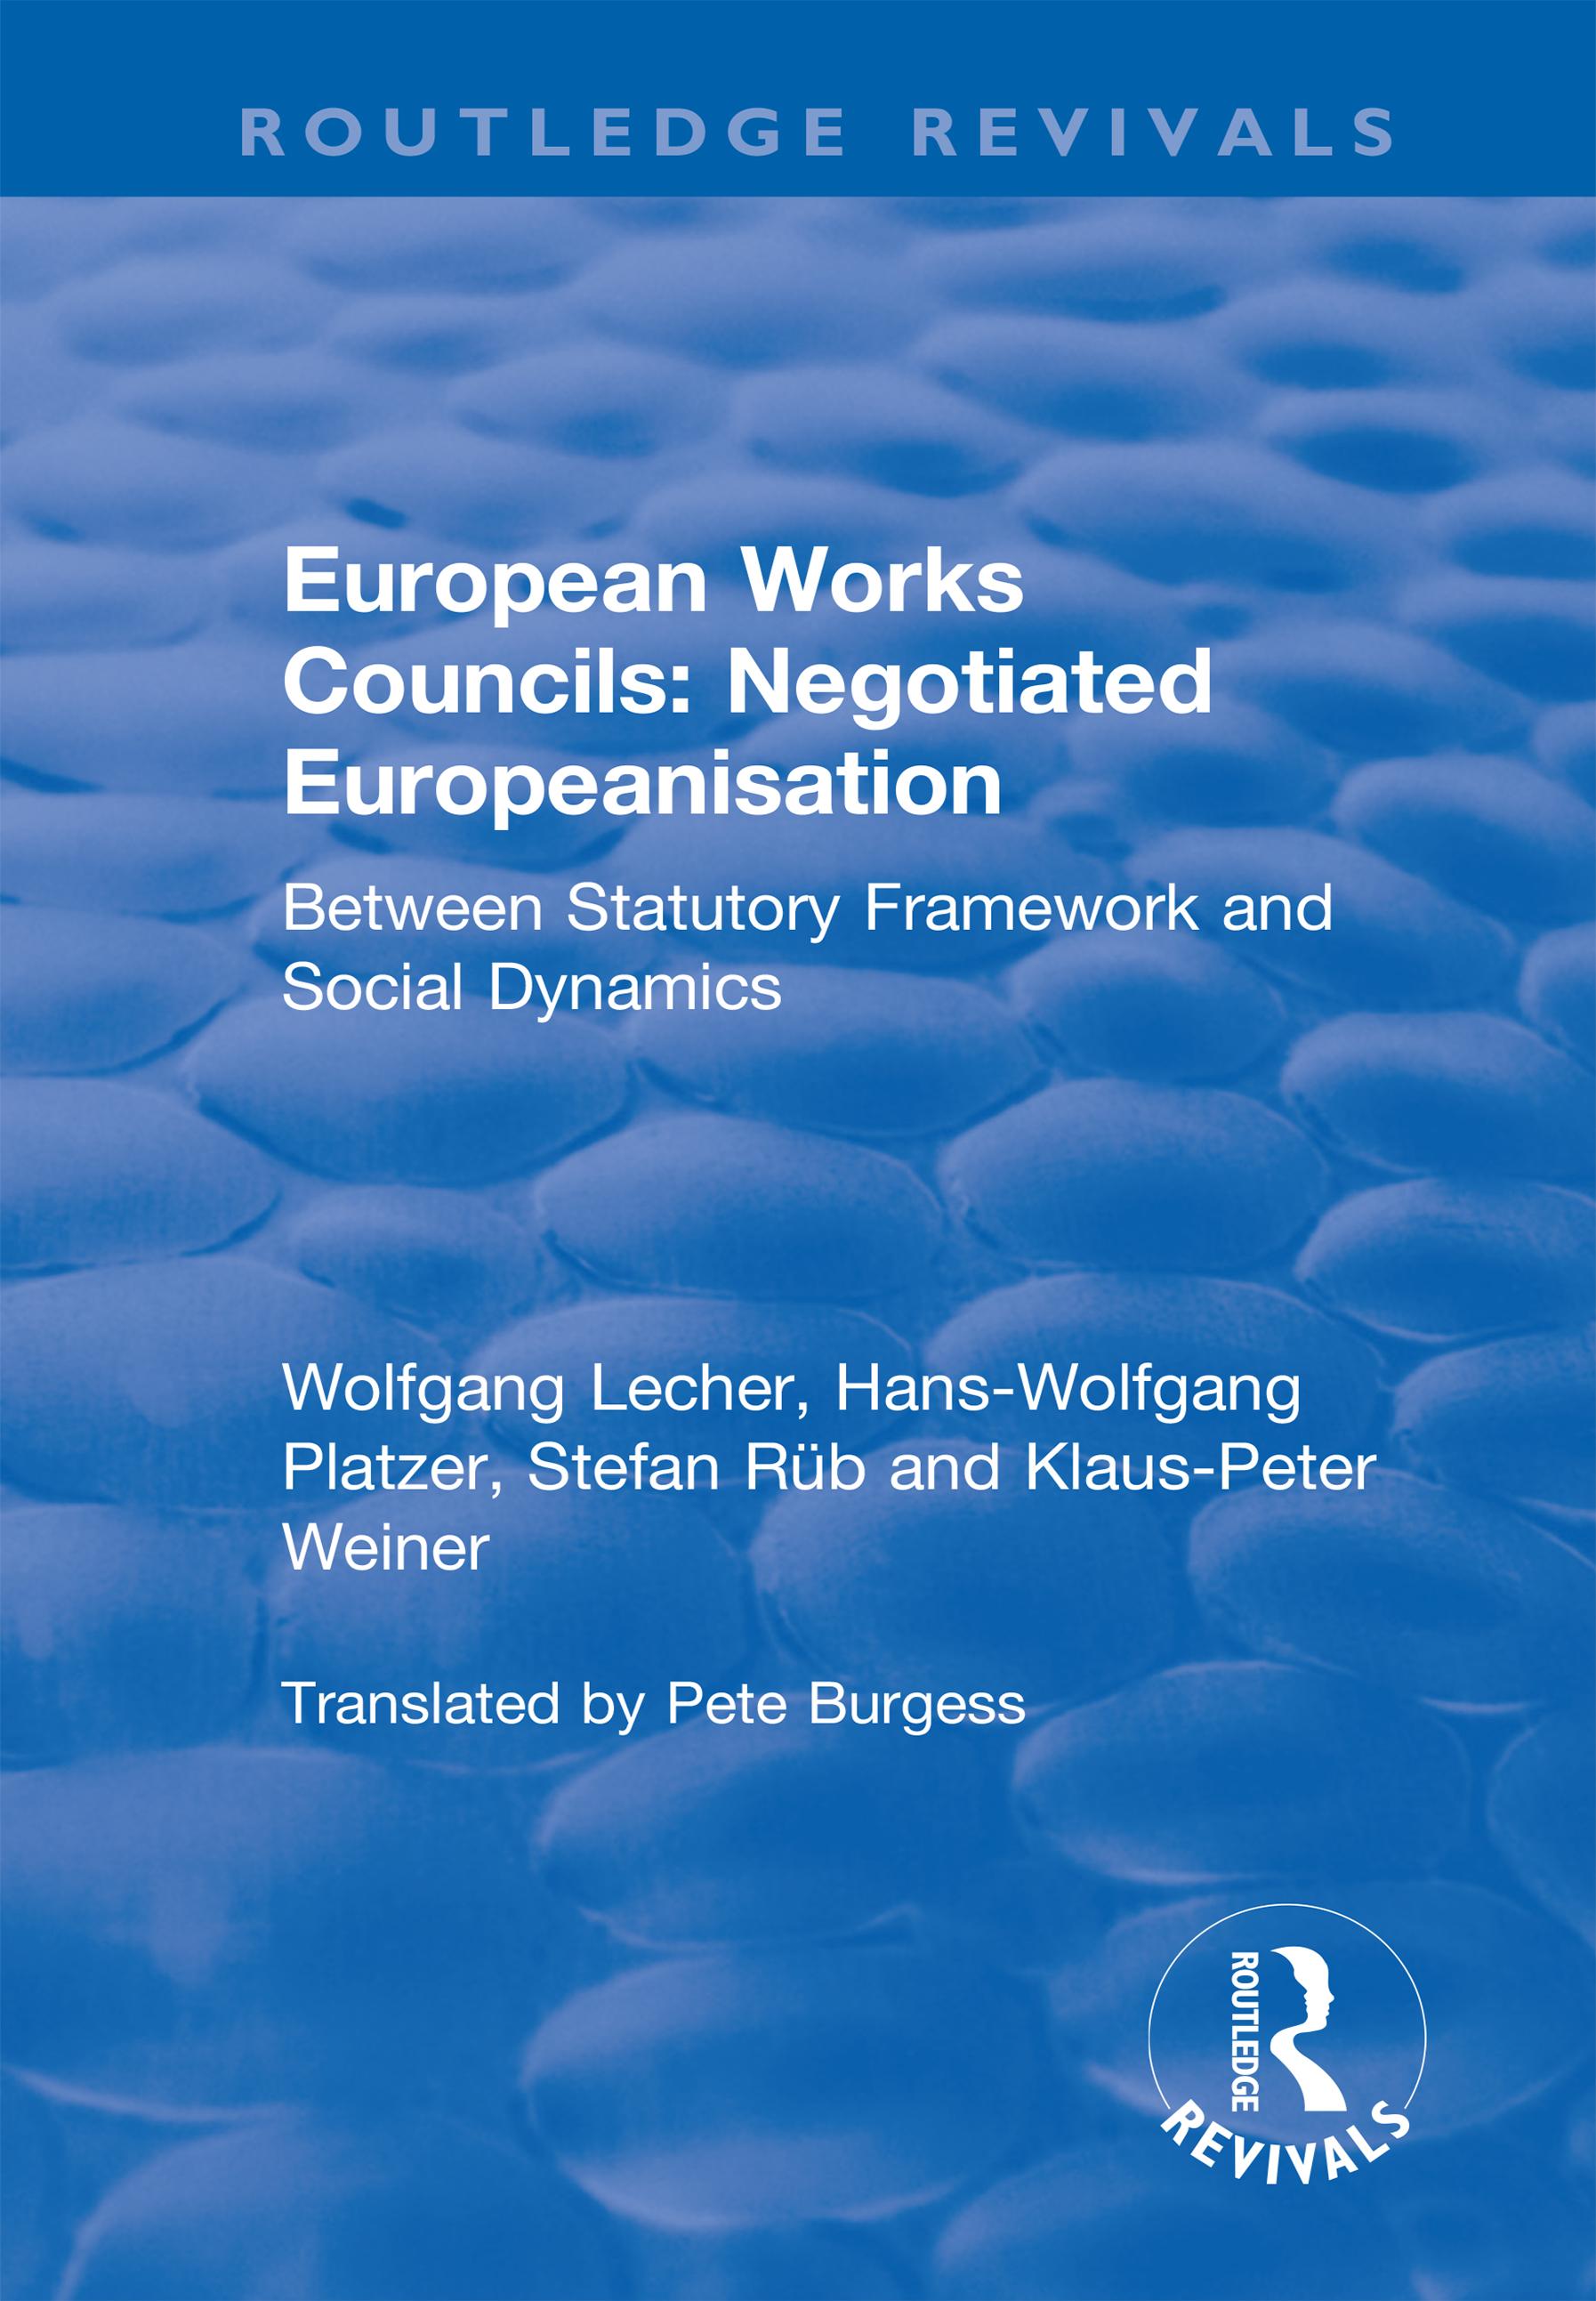 European Works Councils: Negotiated Europeanisation